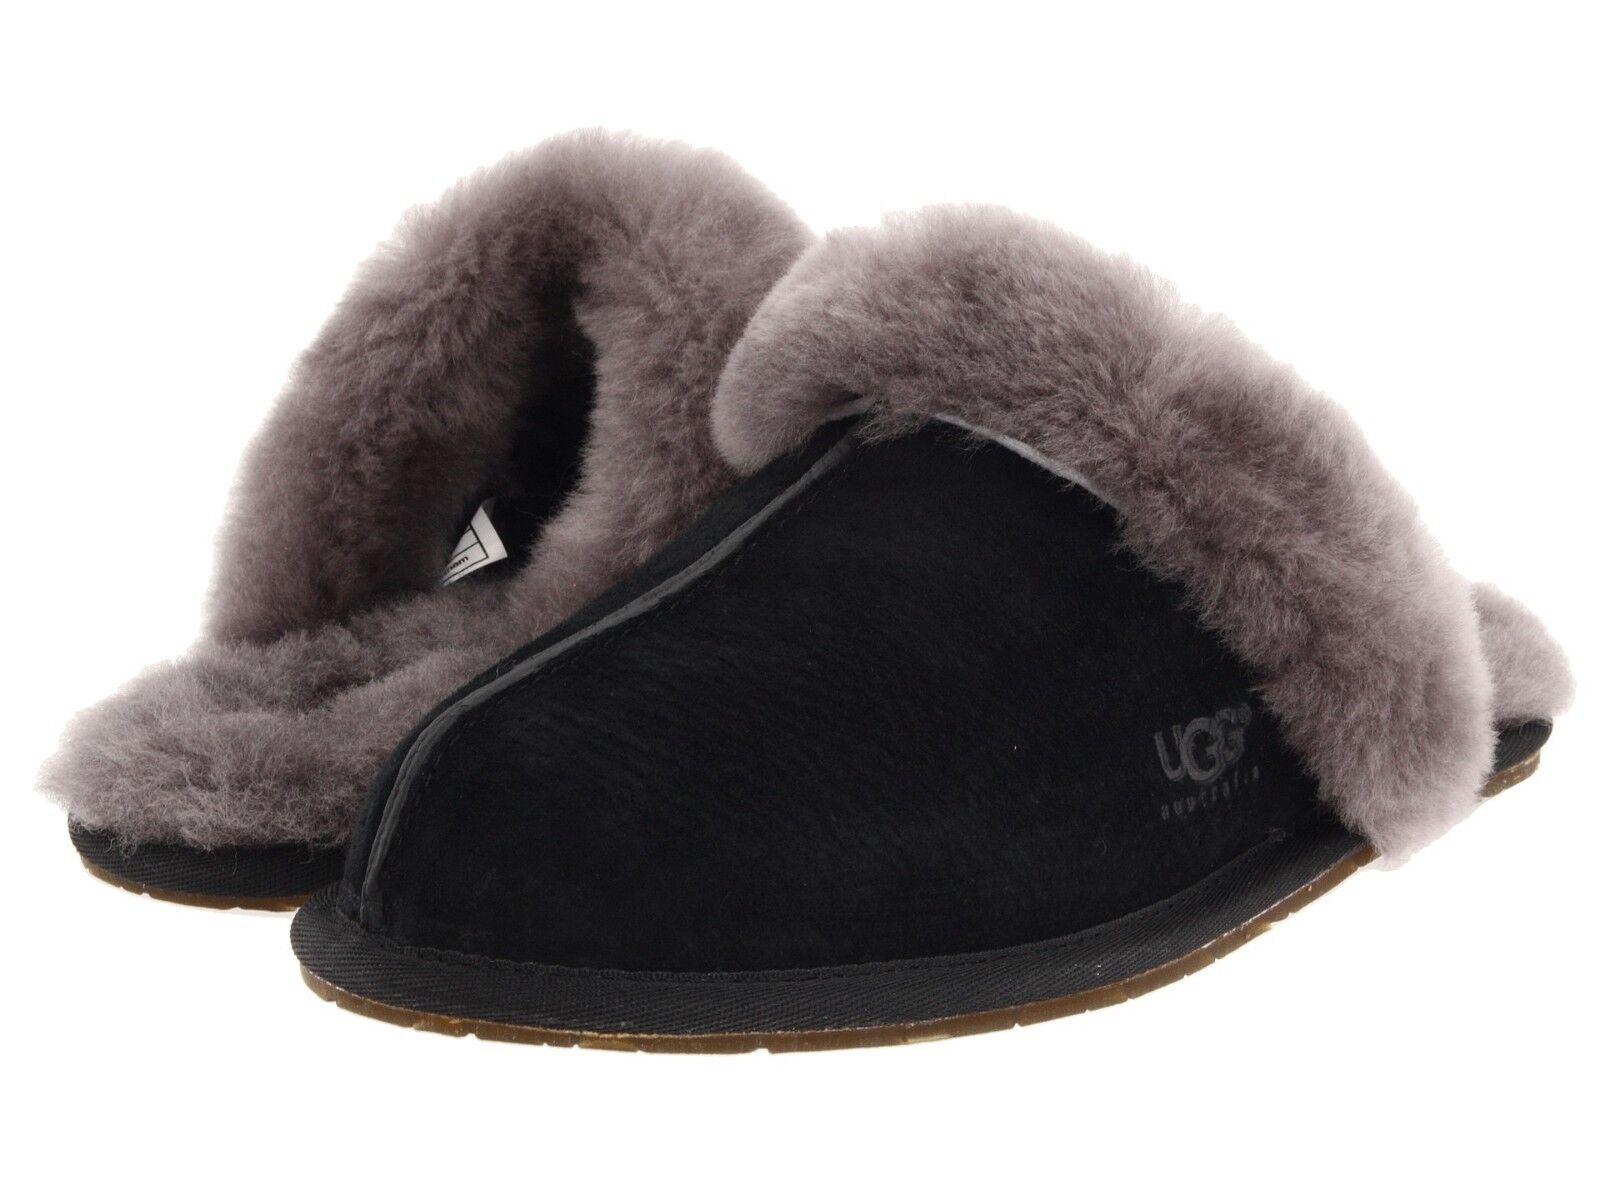 Women's Shoes UGG SCUFFETTE II Slippers 5661 BLACK GREY *New